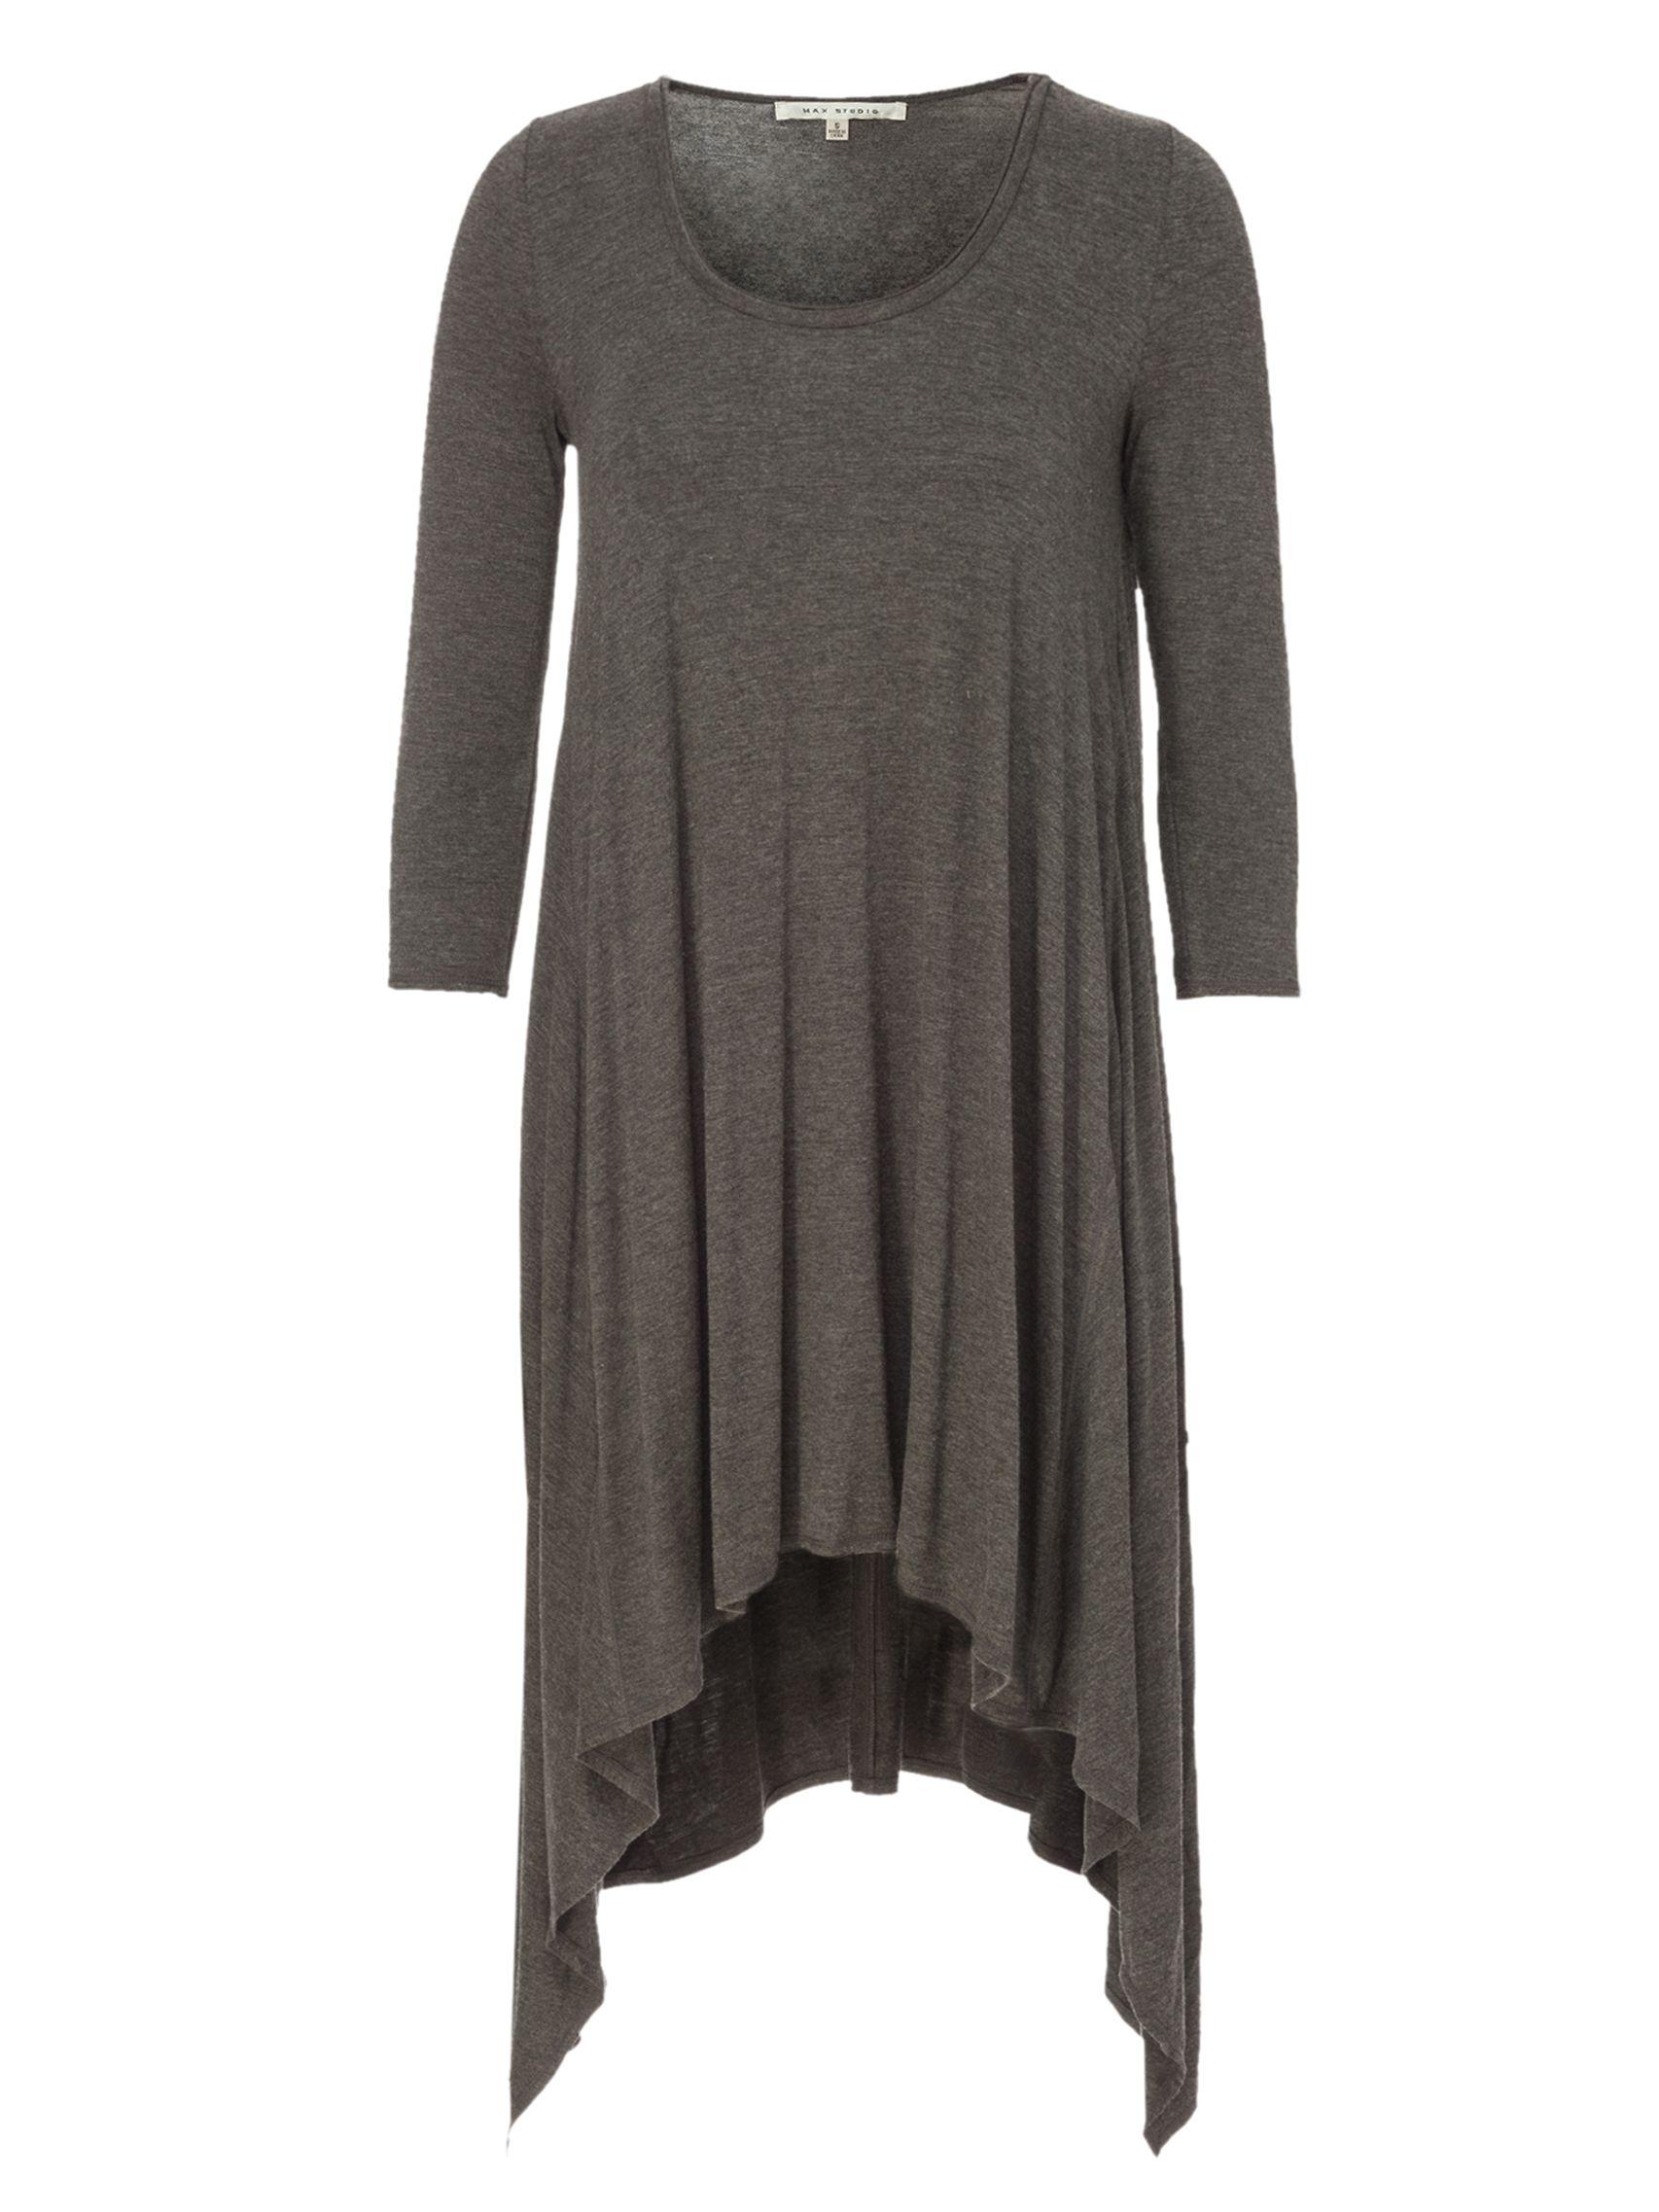 max studio asymmetric hem tunic heather charcoal, max, studio, asymmetric, hem, tunic, heather, charcoal, max studio, clearance, womenswear offers, womens dresses offers, women, womens dresses, special offers, 1621154